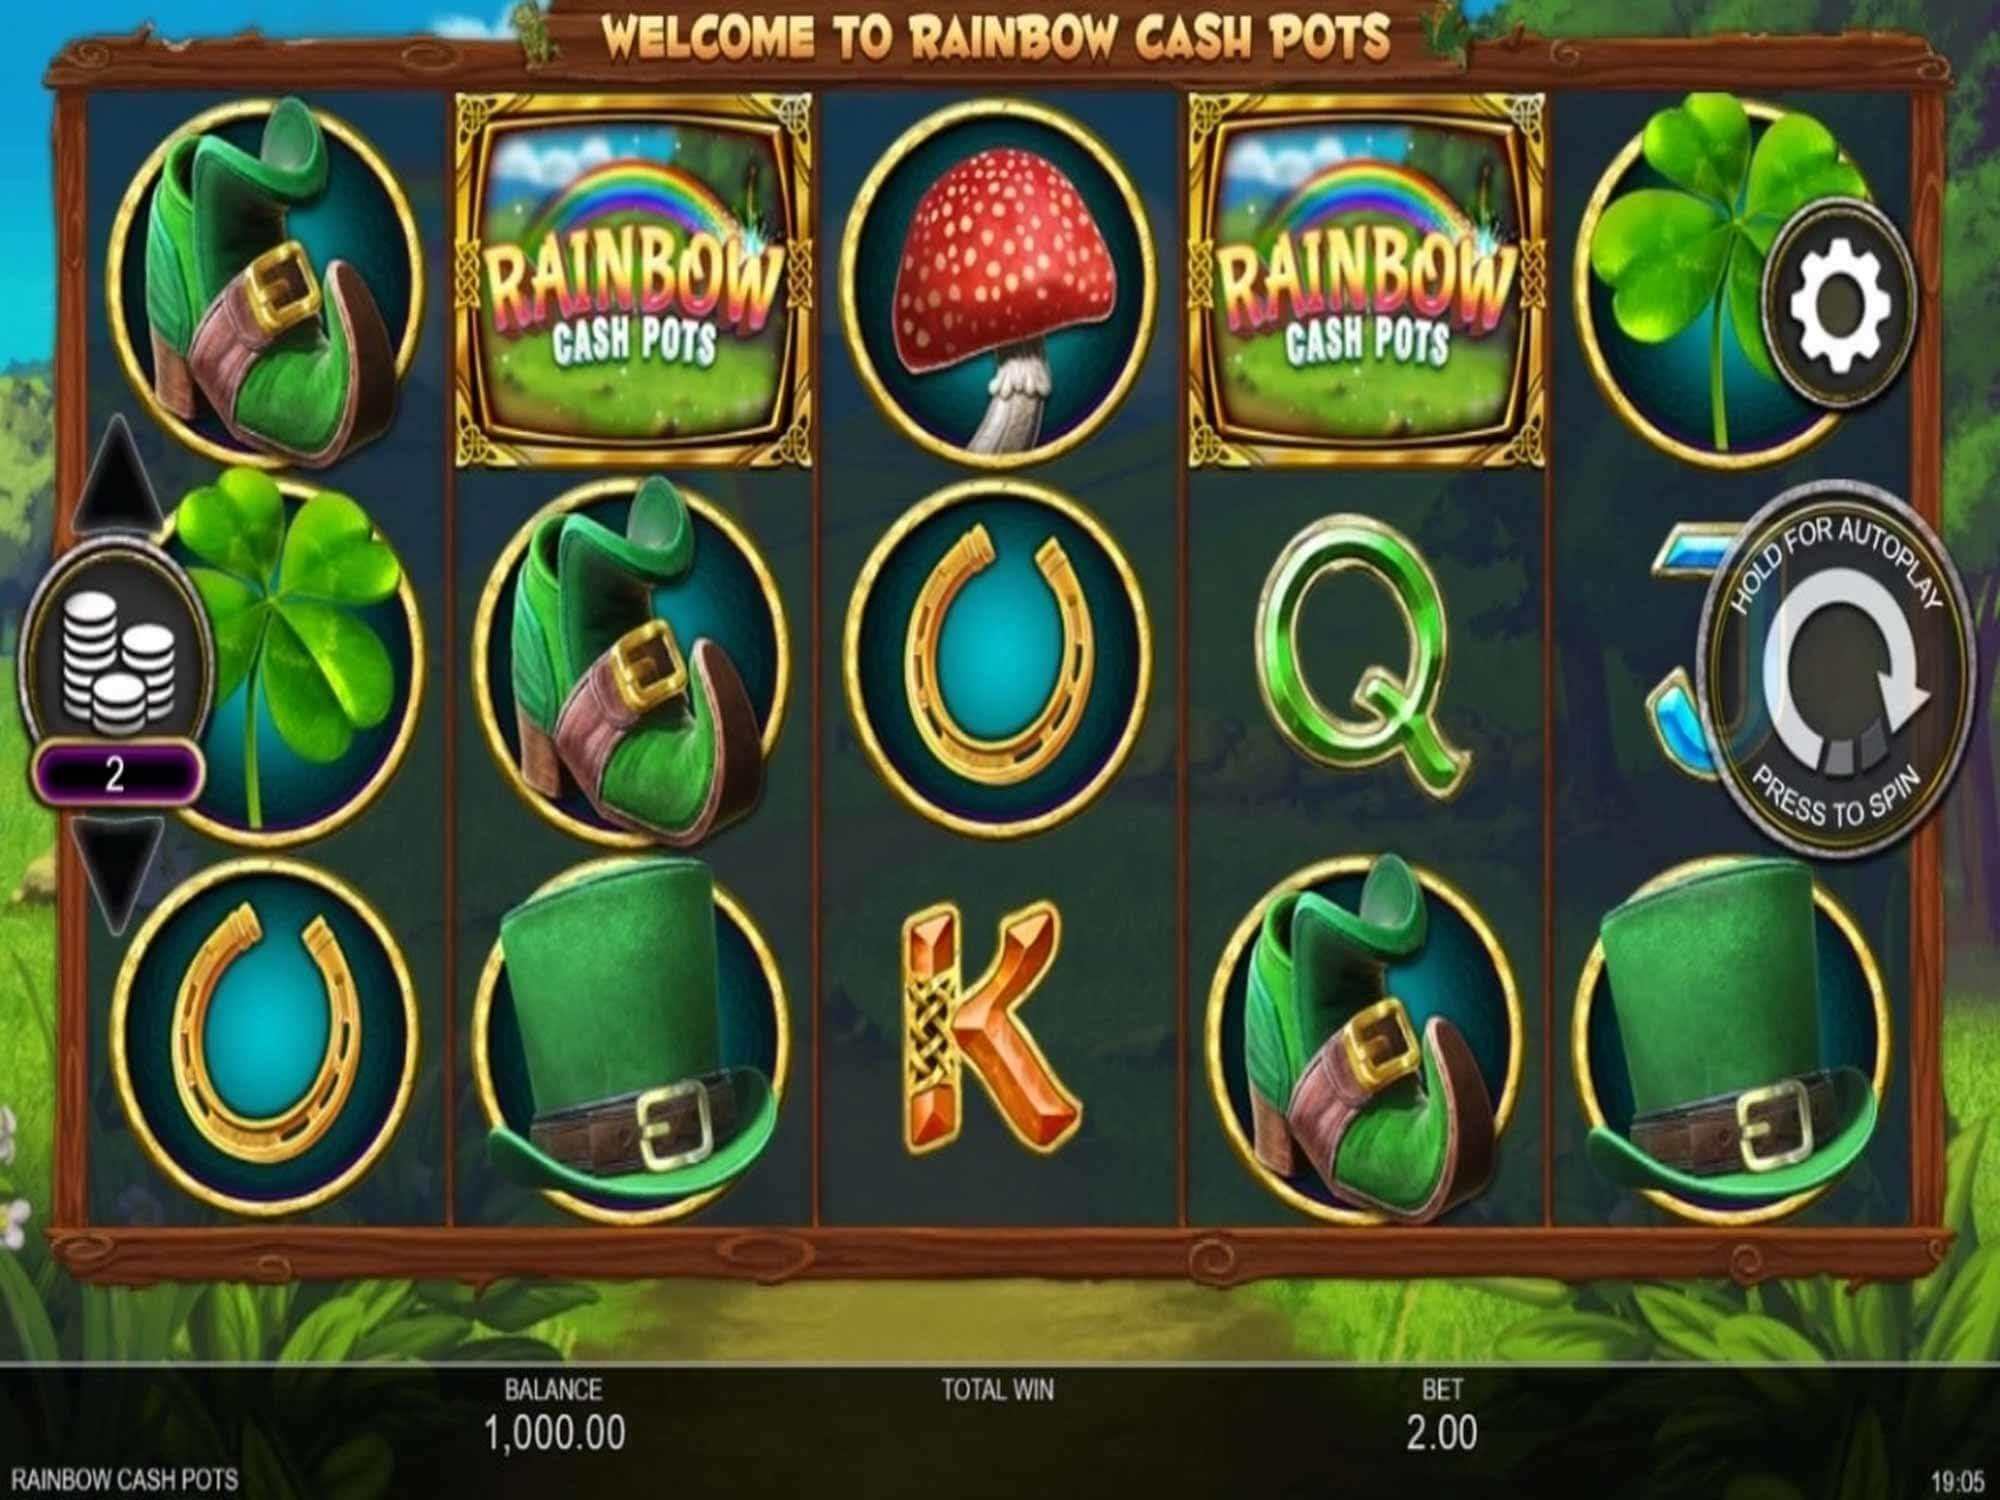 Rainbow Cash Pots Slot Gameplay